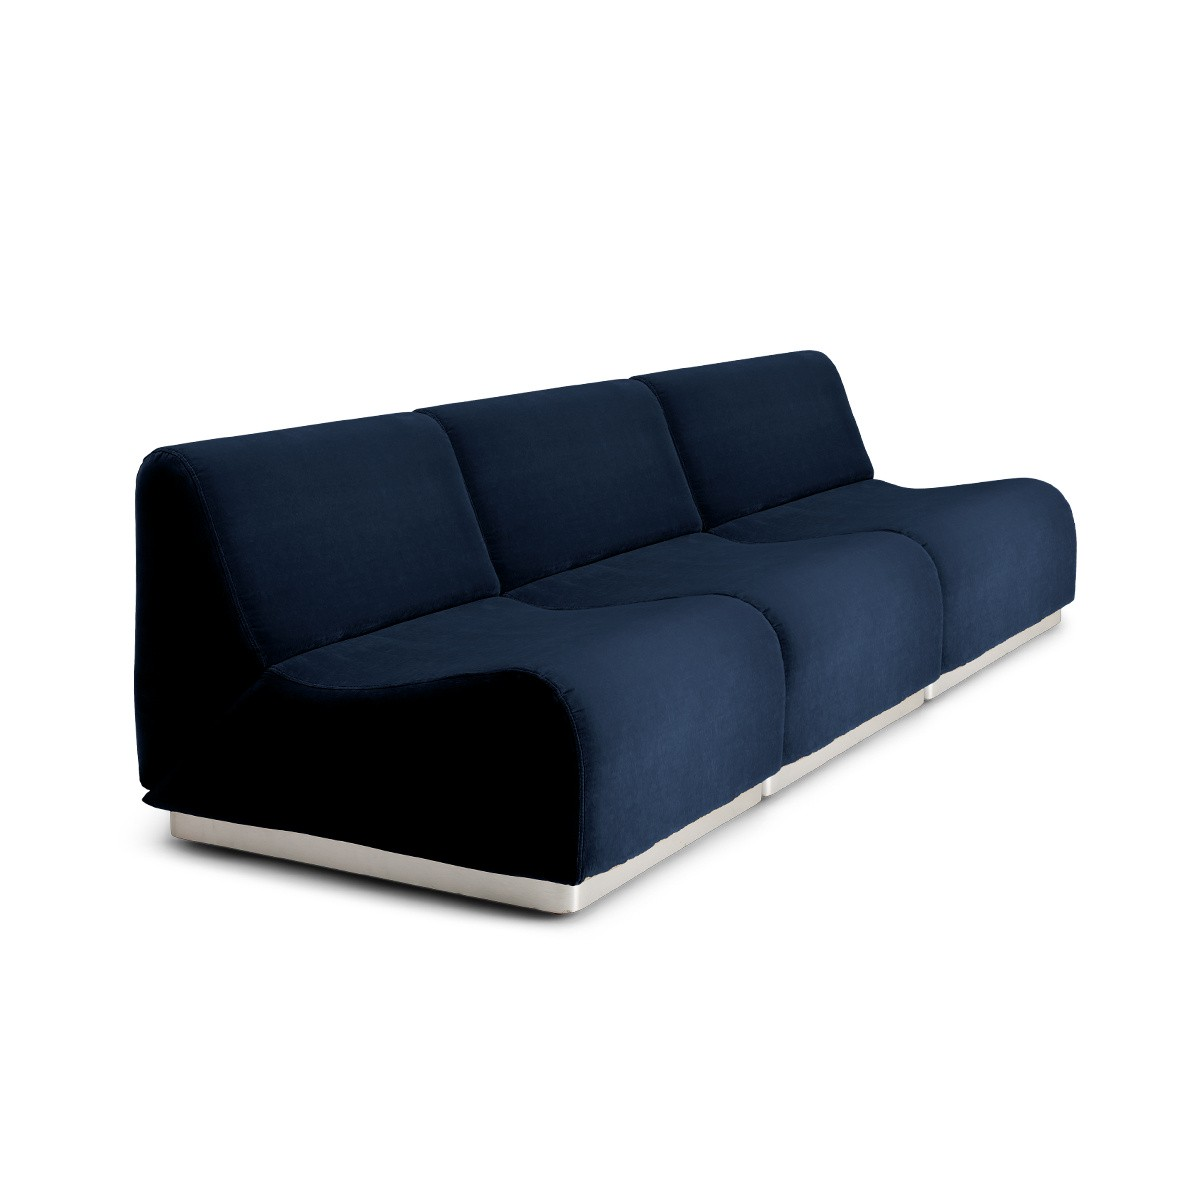 Canapé modulable Rotondo velours bleu nuit